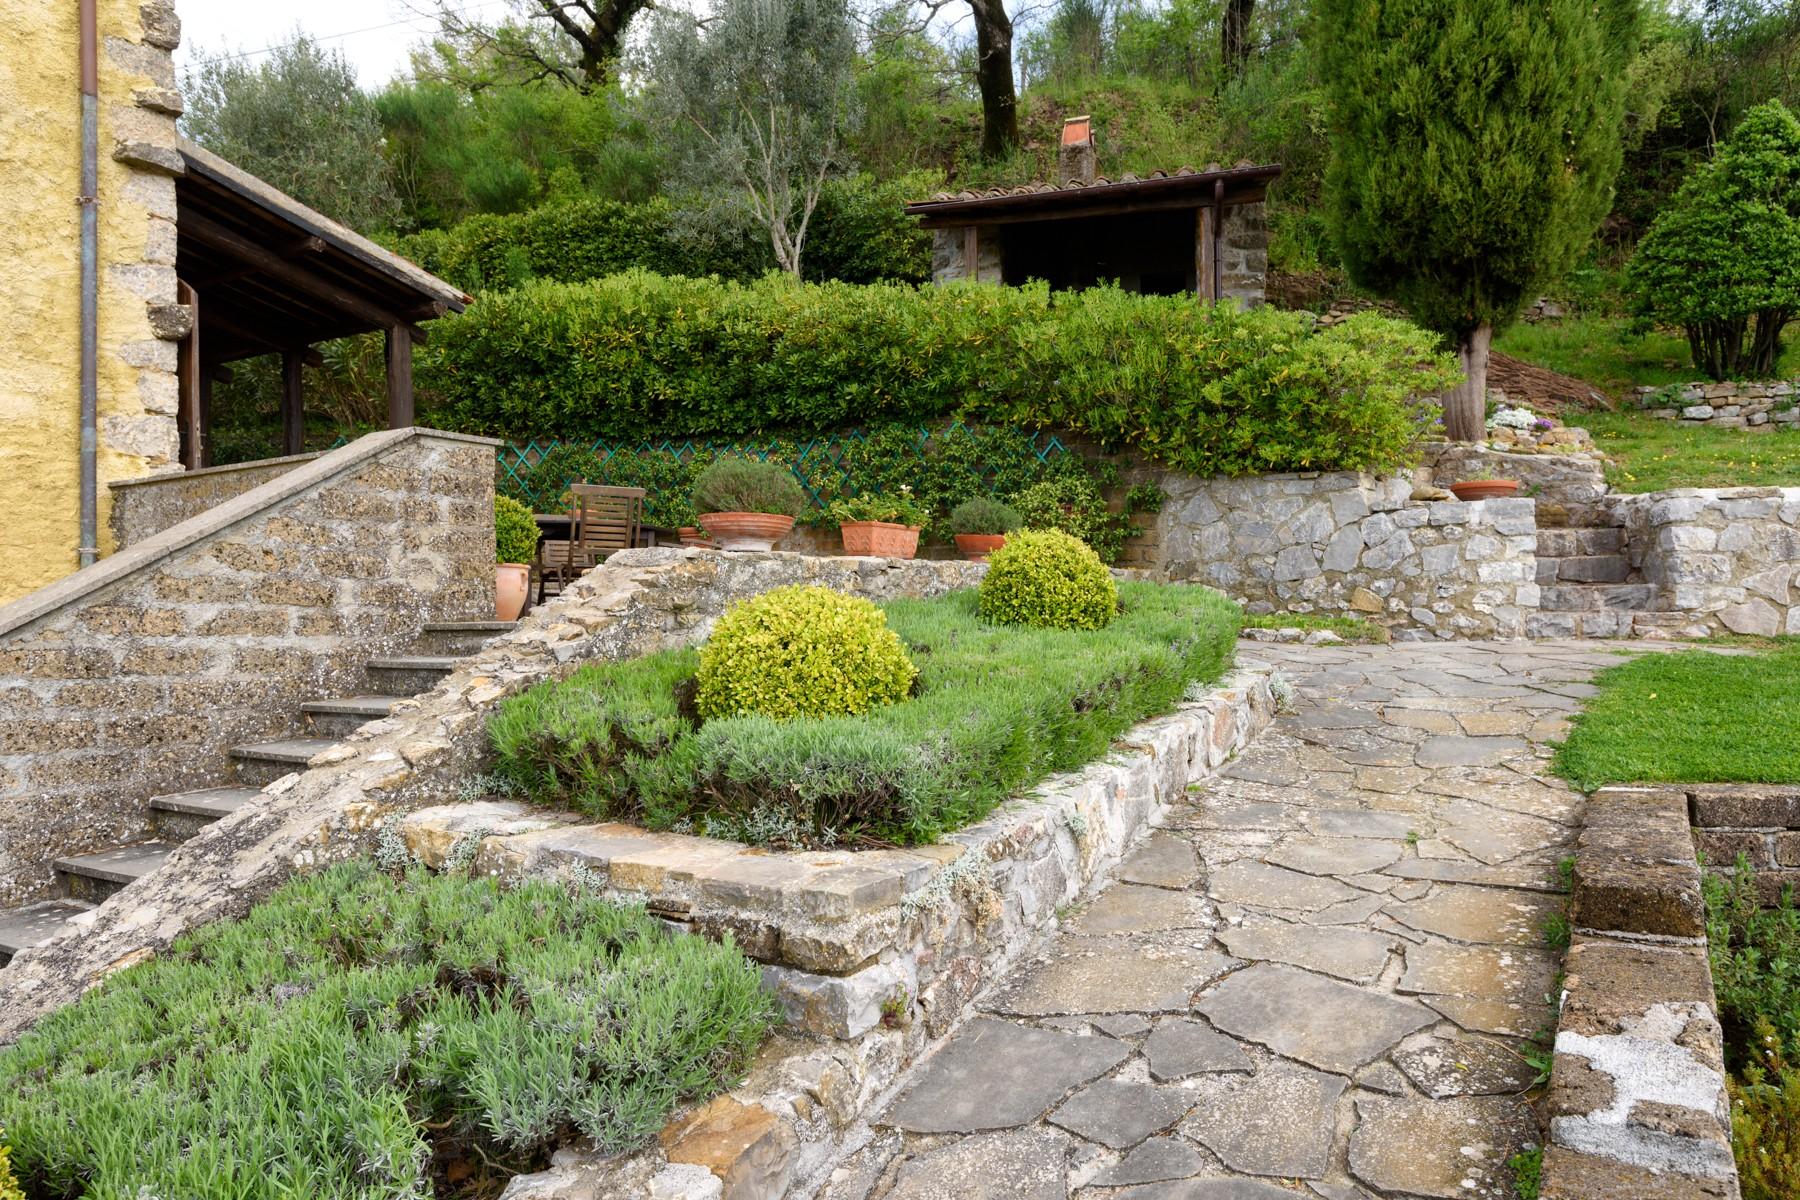 Casa indipendente in Vendita a Semproniano: 4 locali, 220 mq - Foto 7